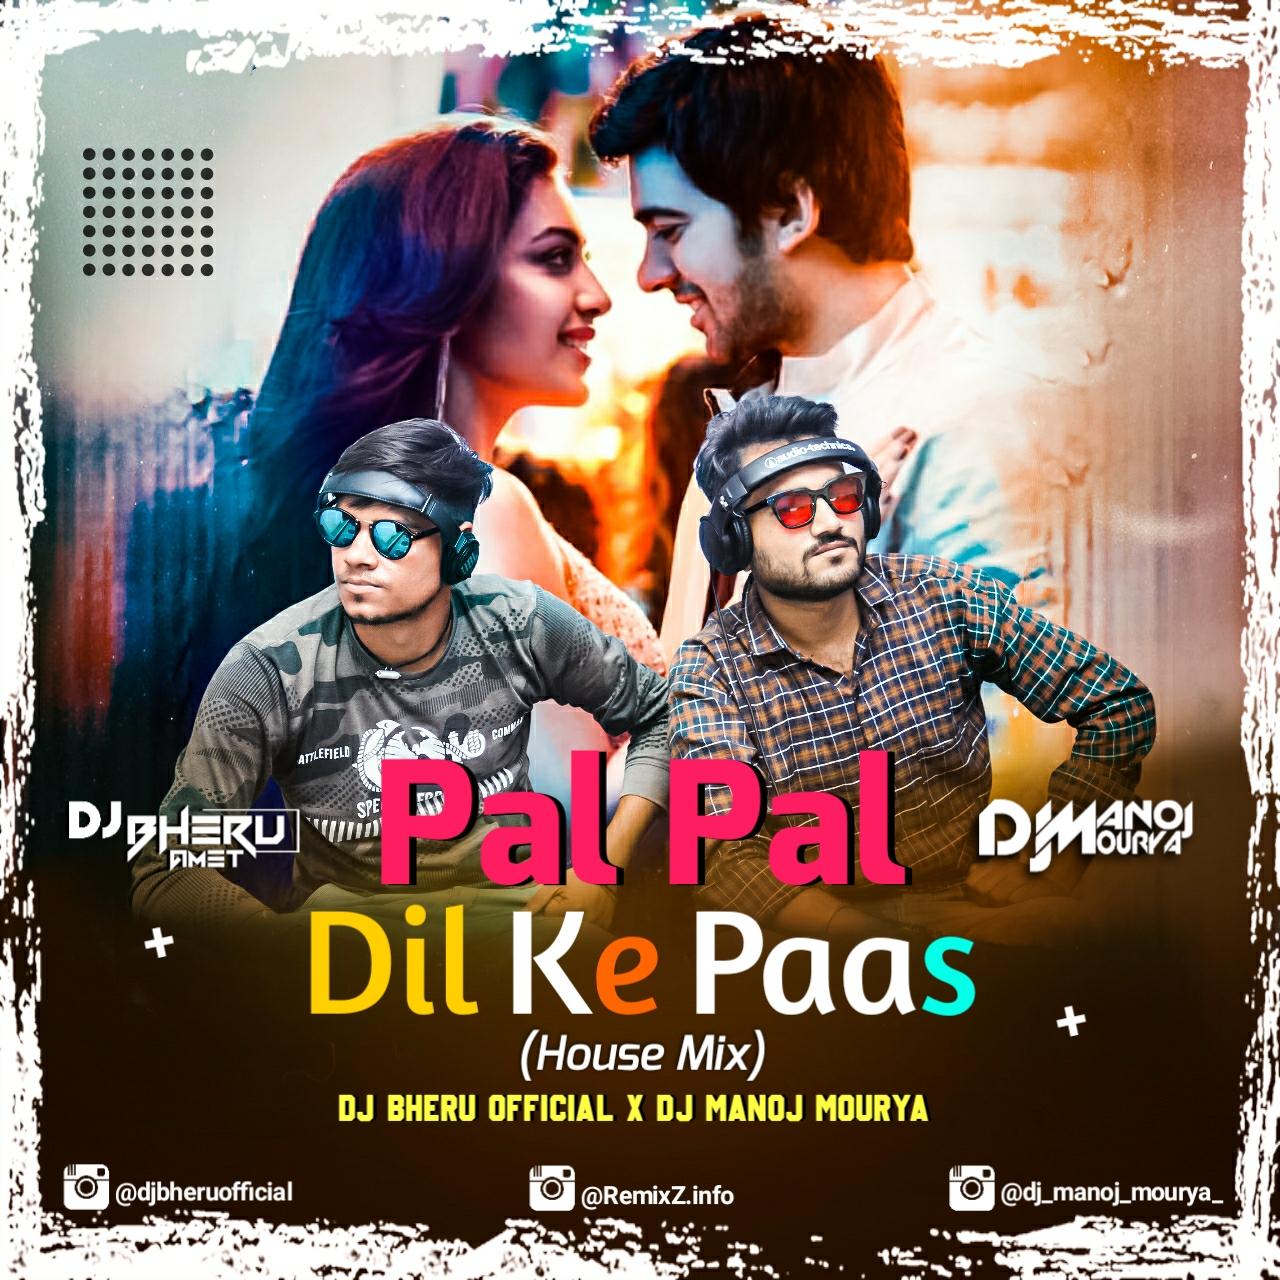 pal-pal-dil-ke-paas-house-mix-dj-bheru-x-dj-manoj.jpg